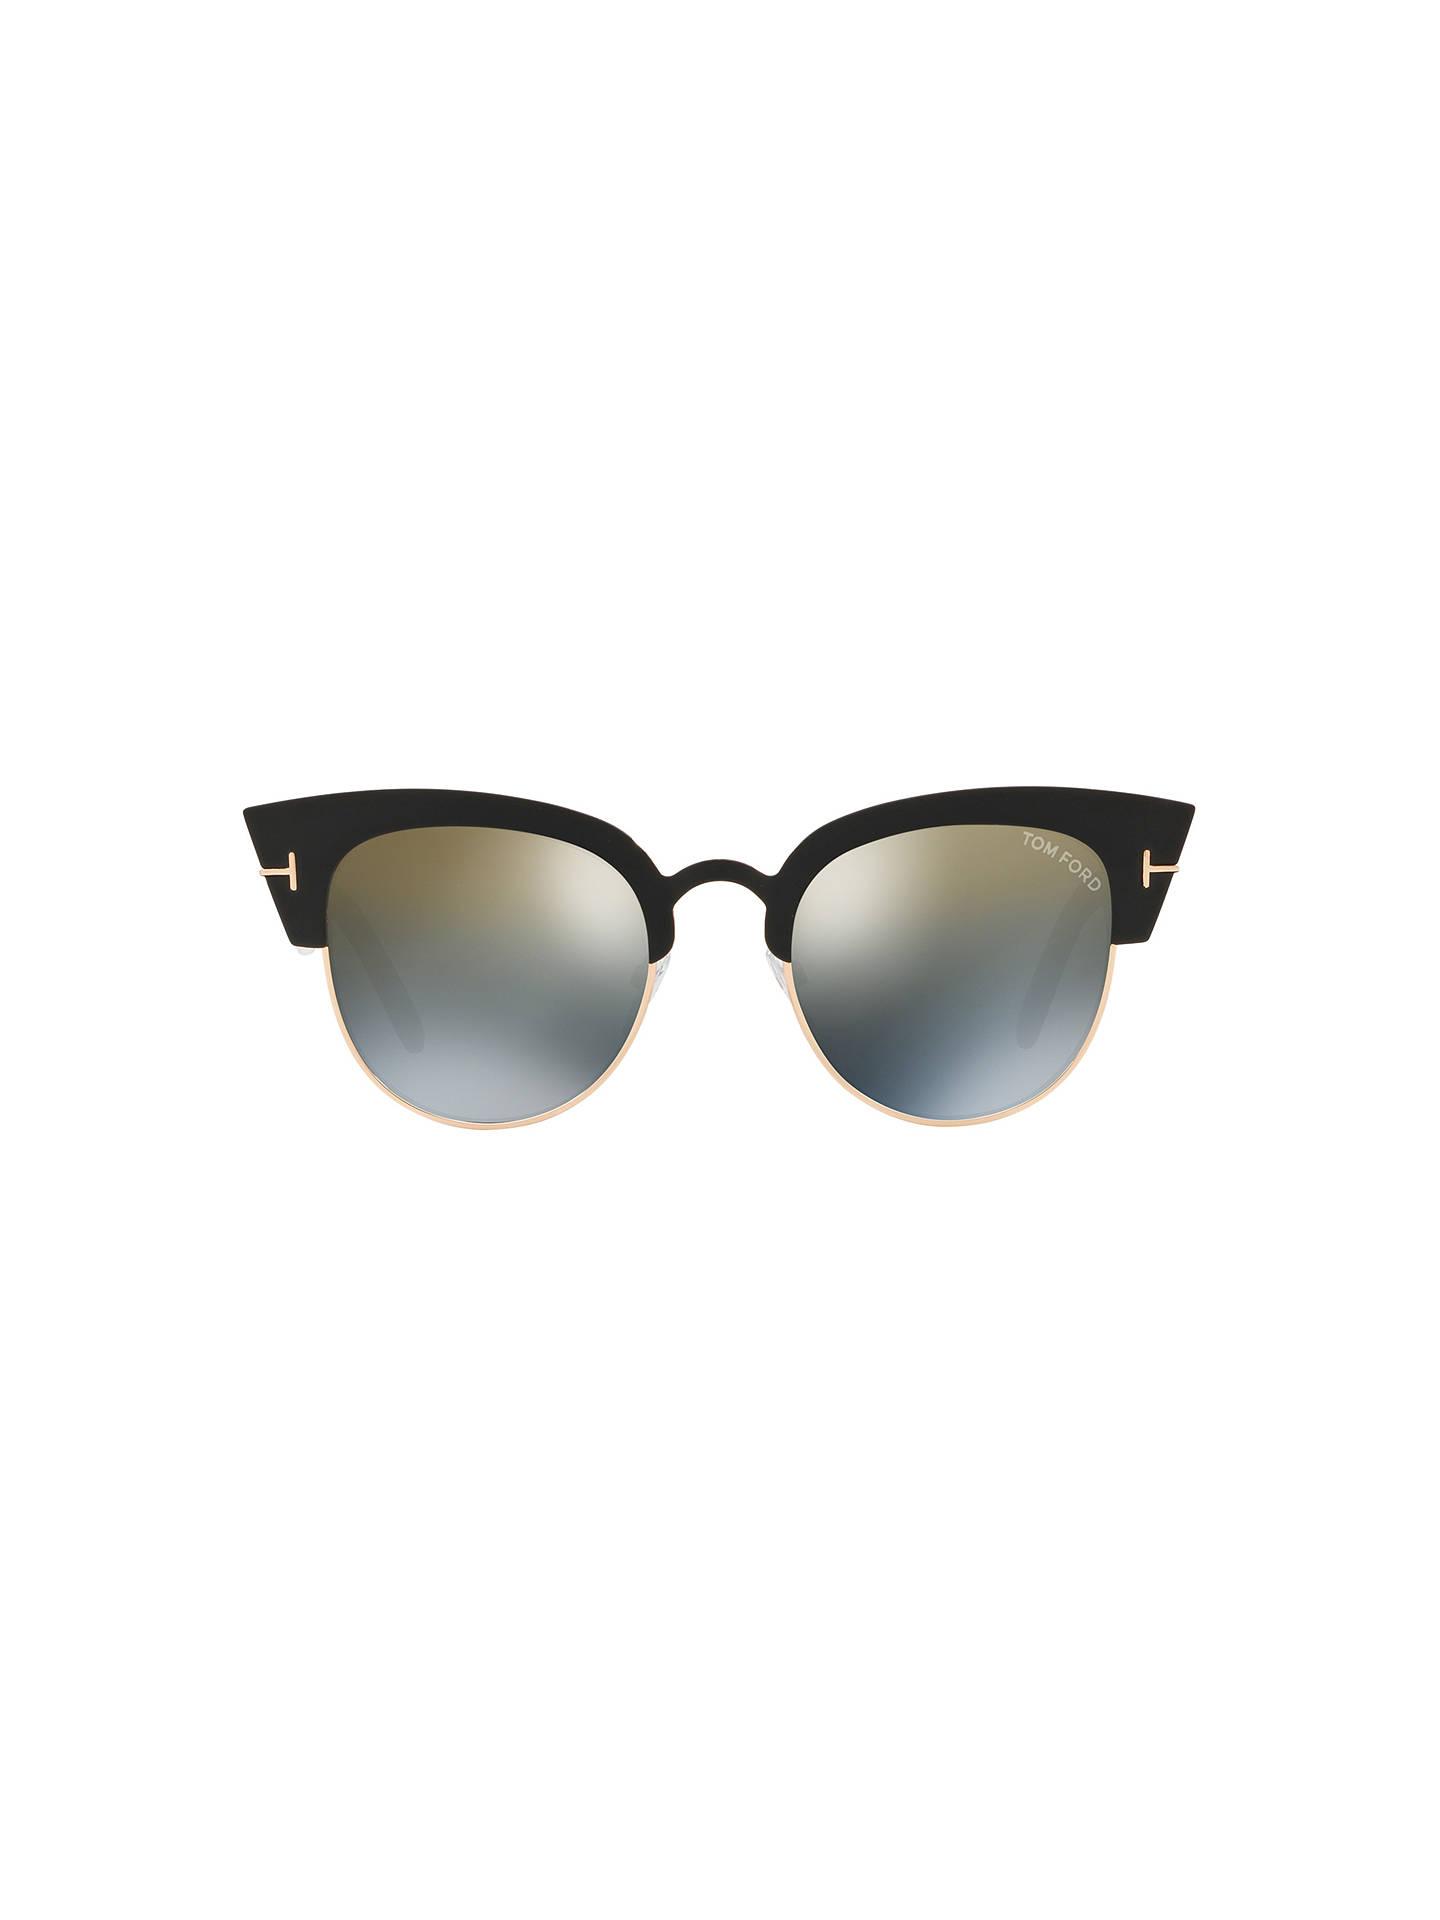 0f37db2ec11 ... Buy TOM FORD FT0607 Women s Alexandra Cat s Eye Sunglasses